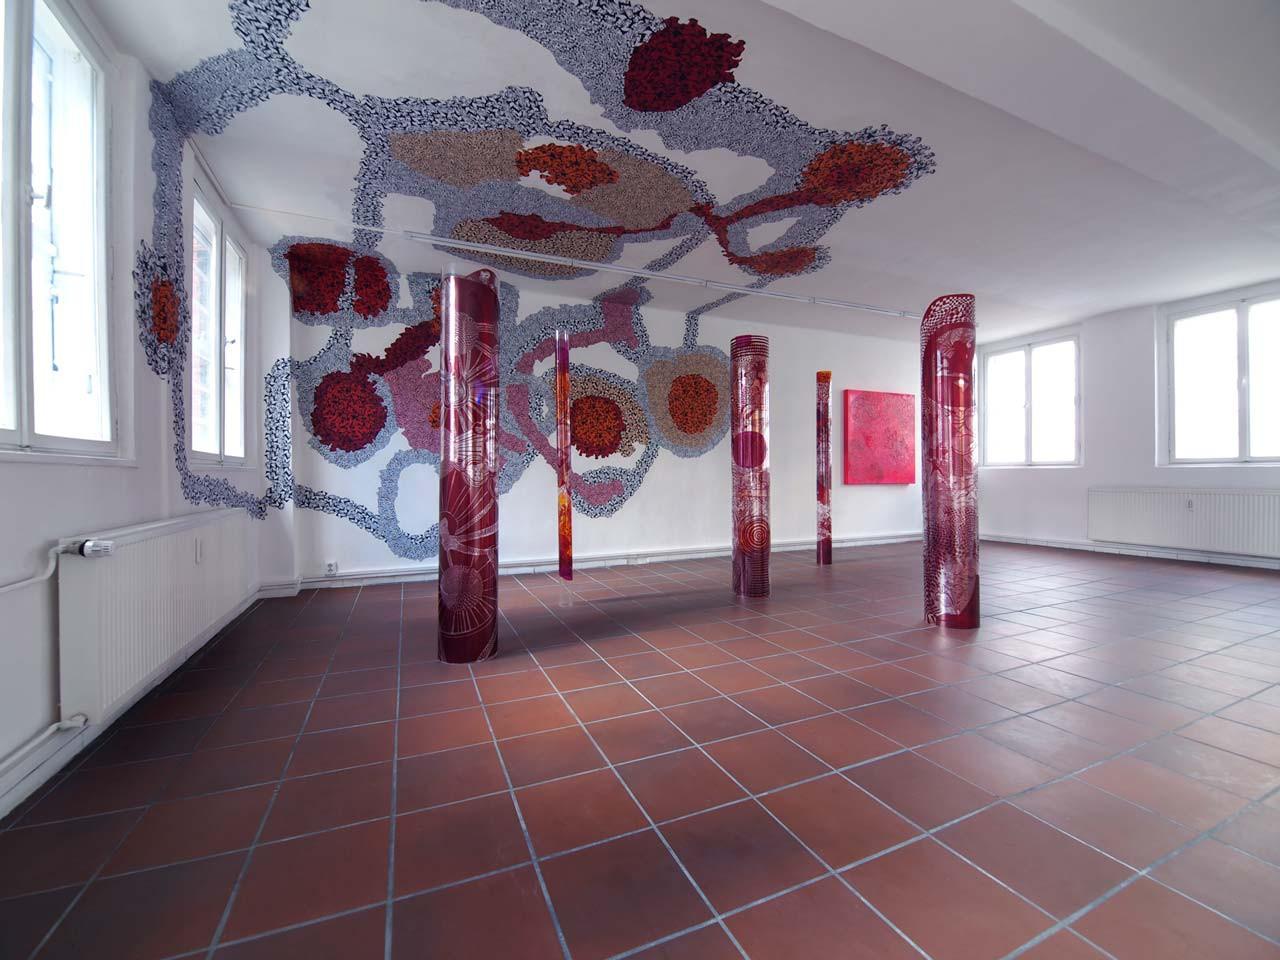 """Sounds of Silence"", 2013, Bräuning Contemporary, Hamburg, Germany"